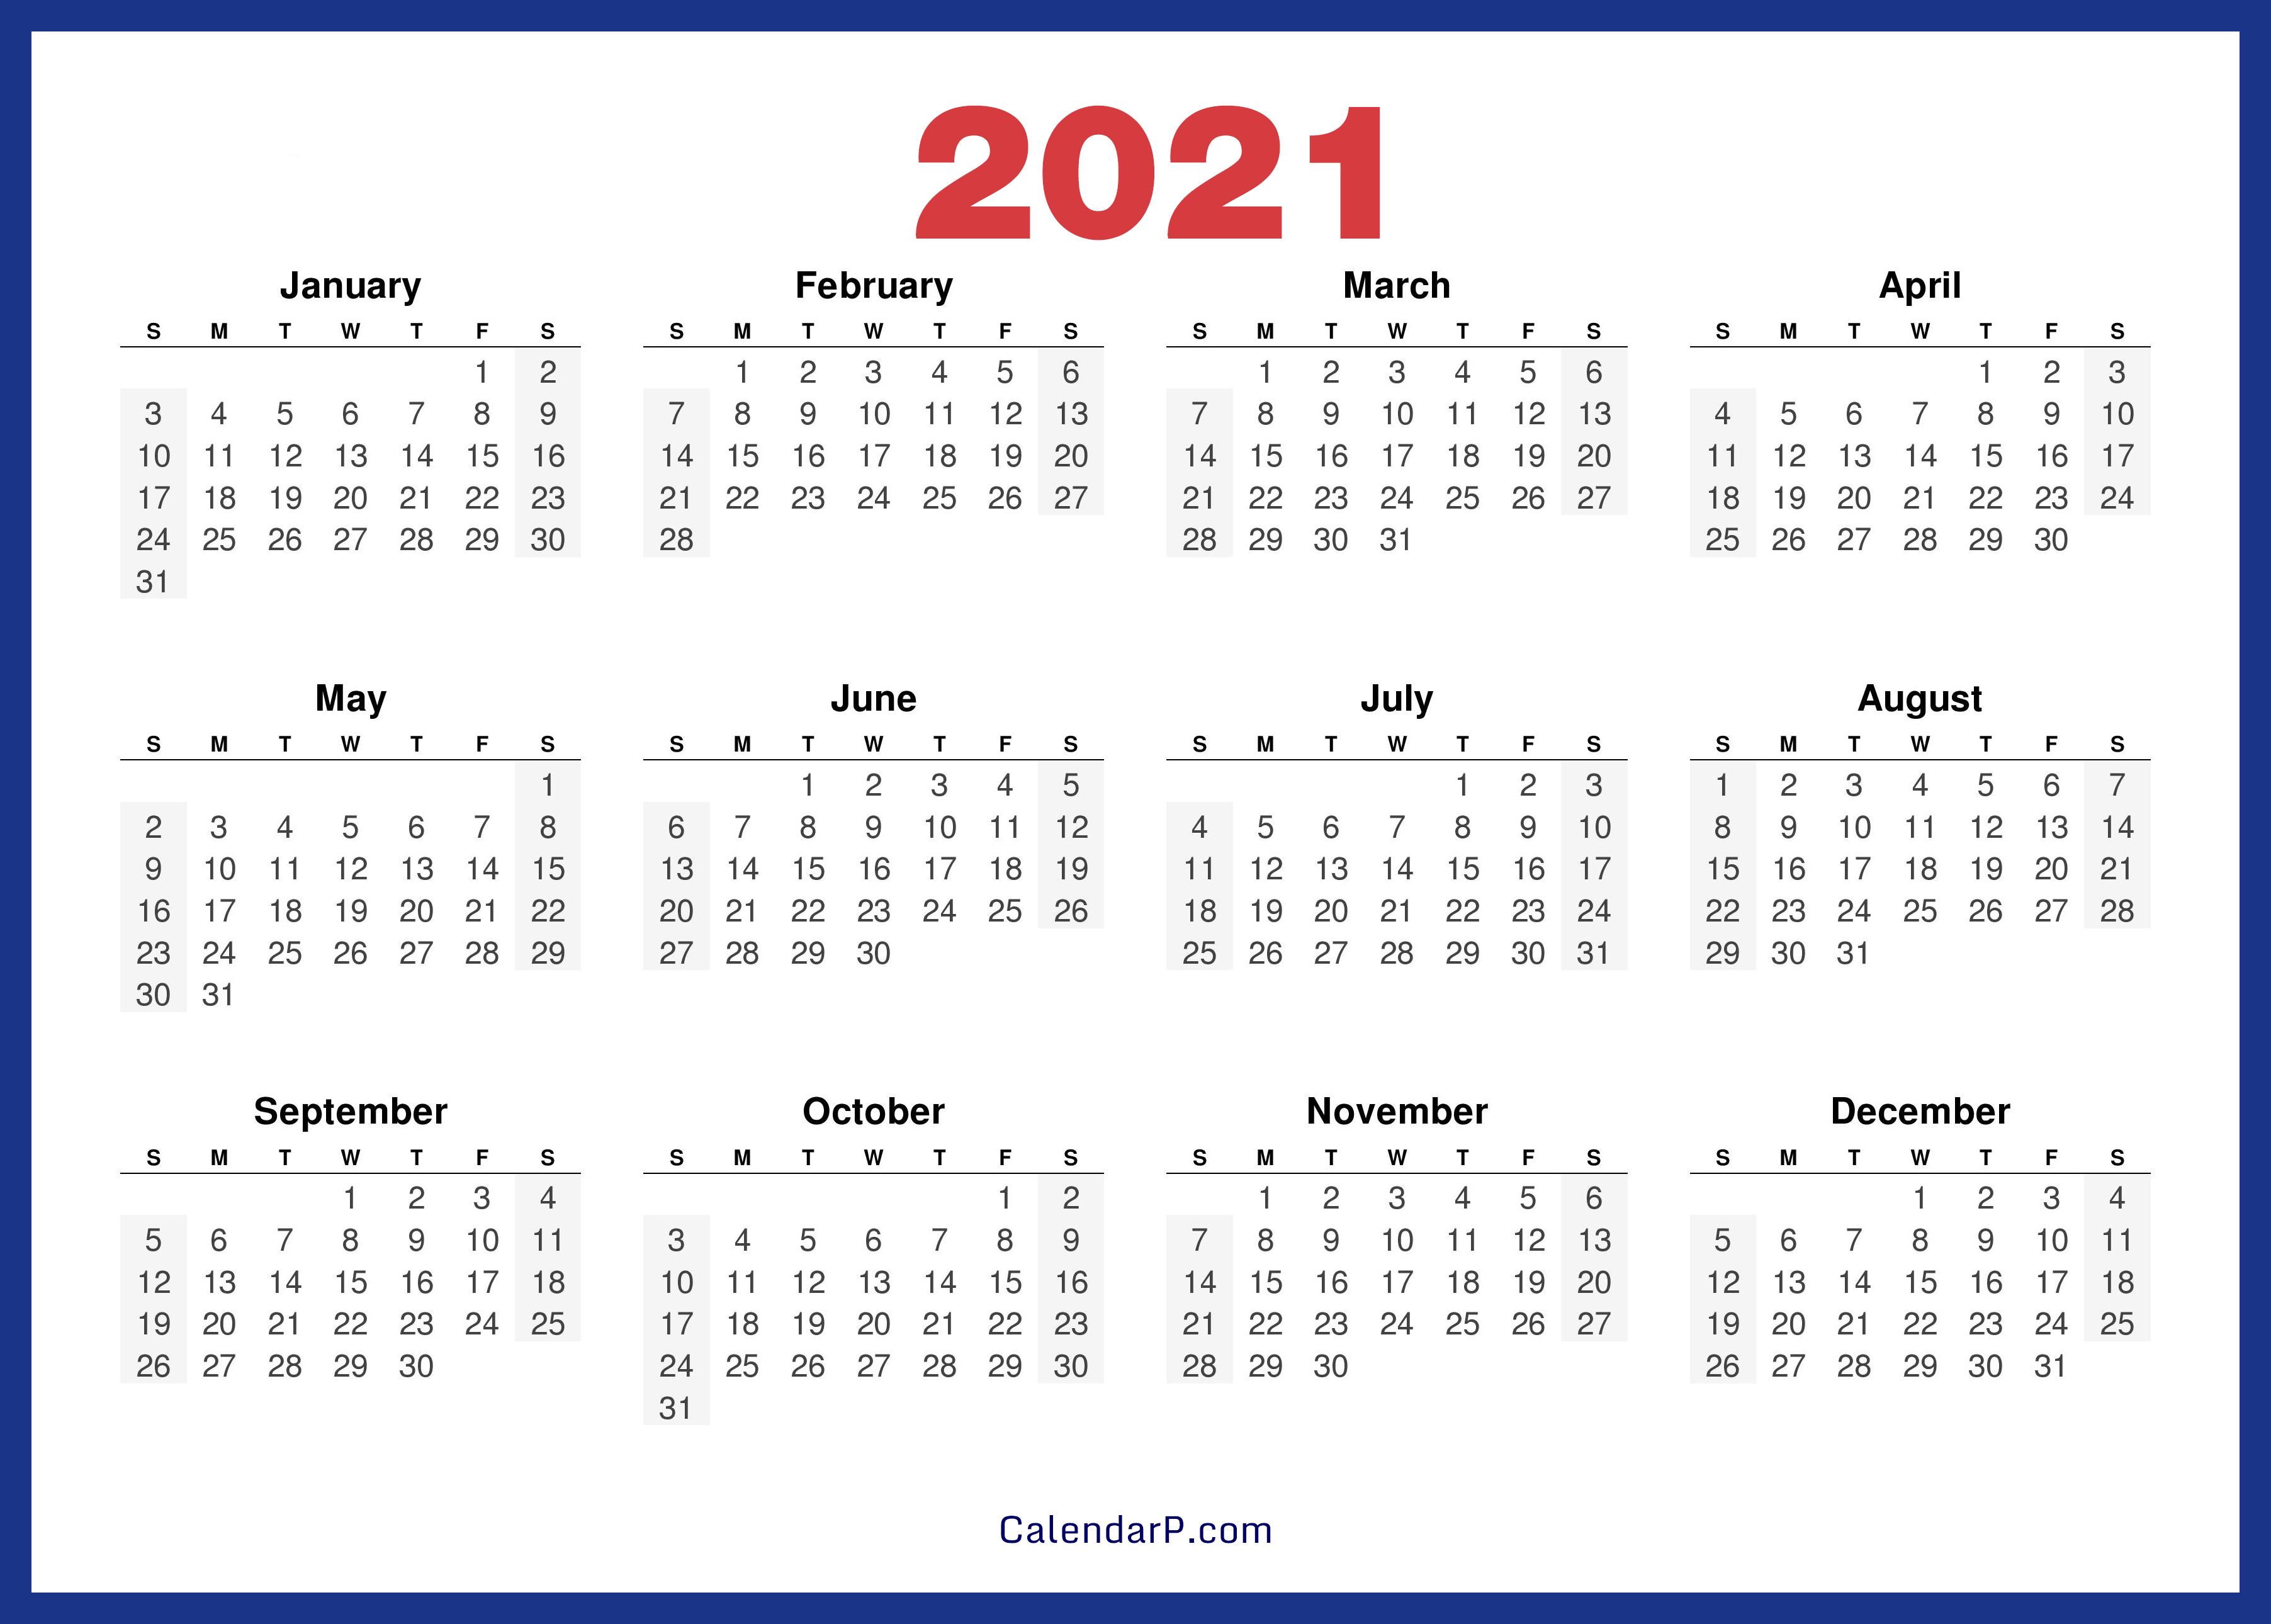 2021 Calendar Printable Free, HD - Navy Blue - CalendarP ...